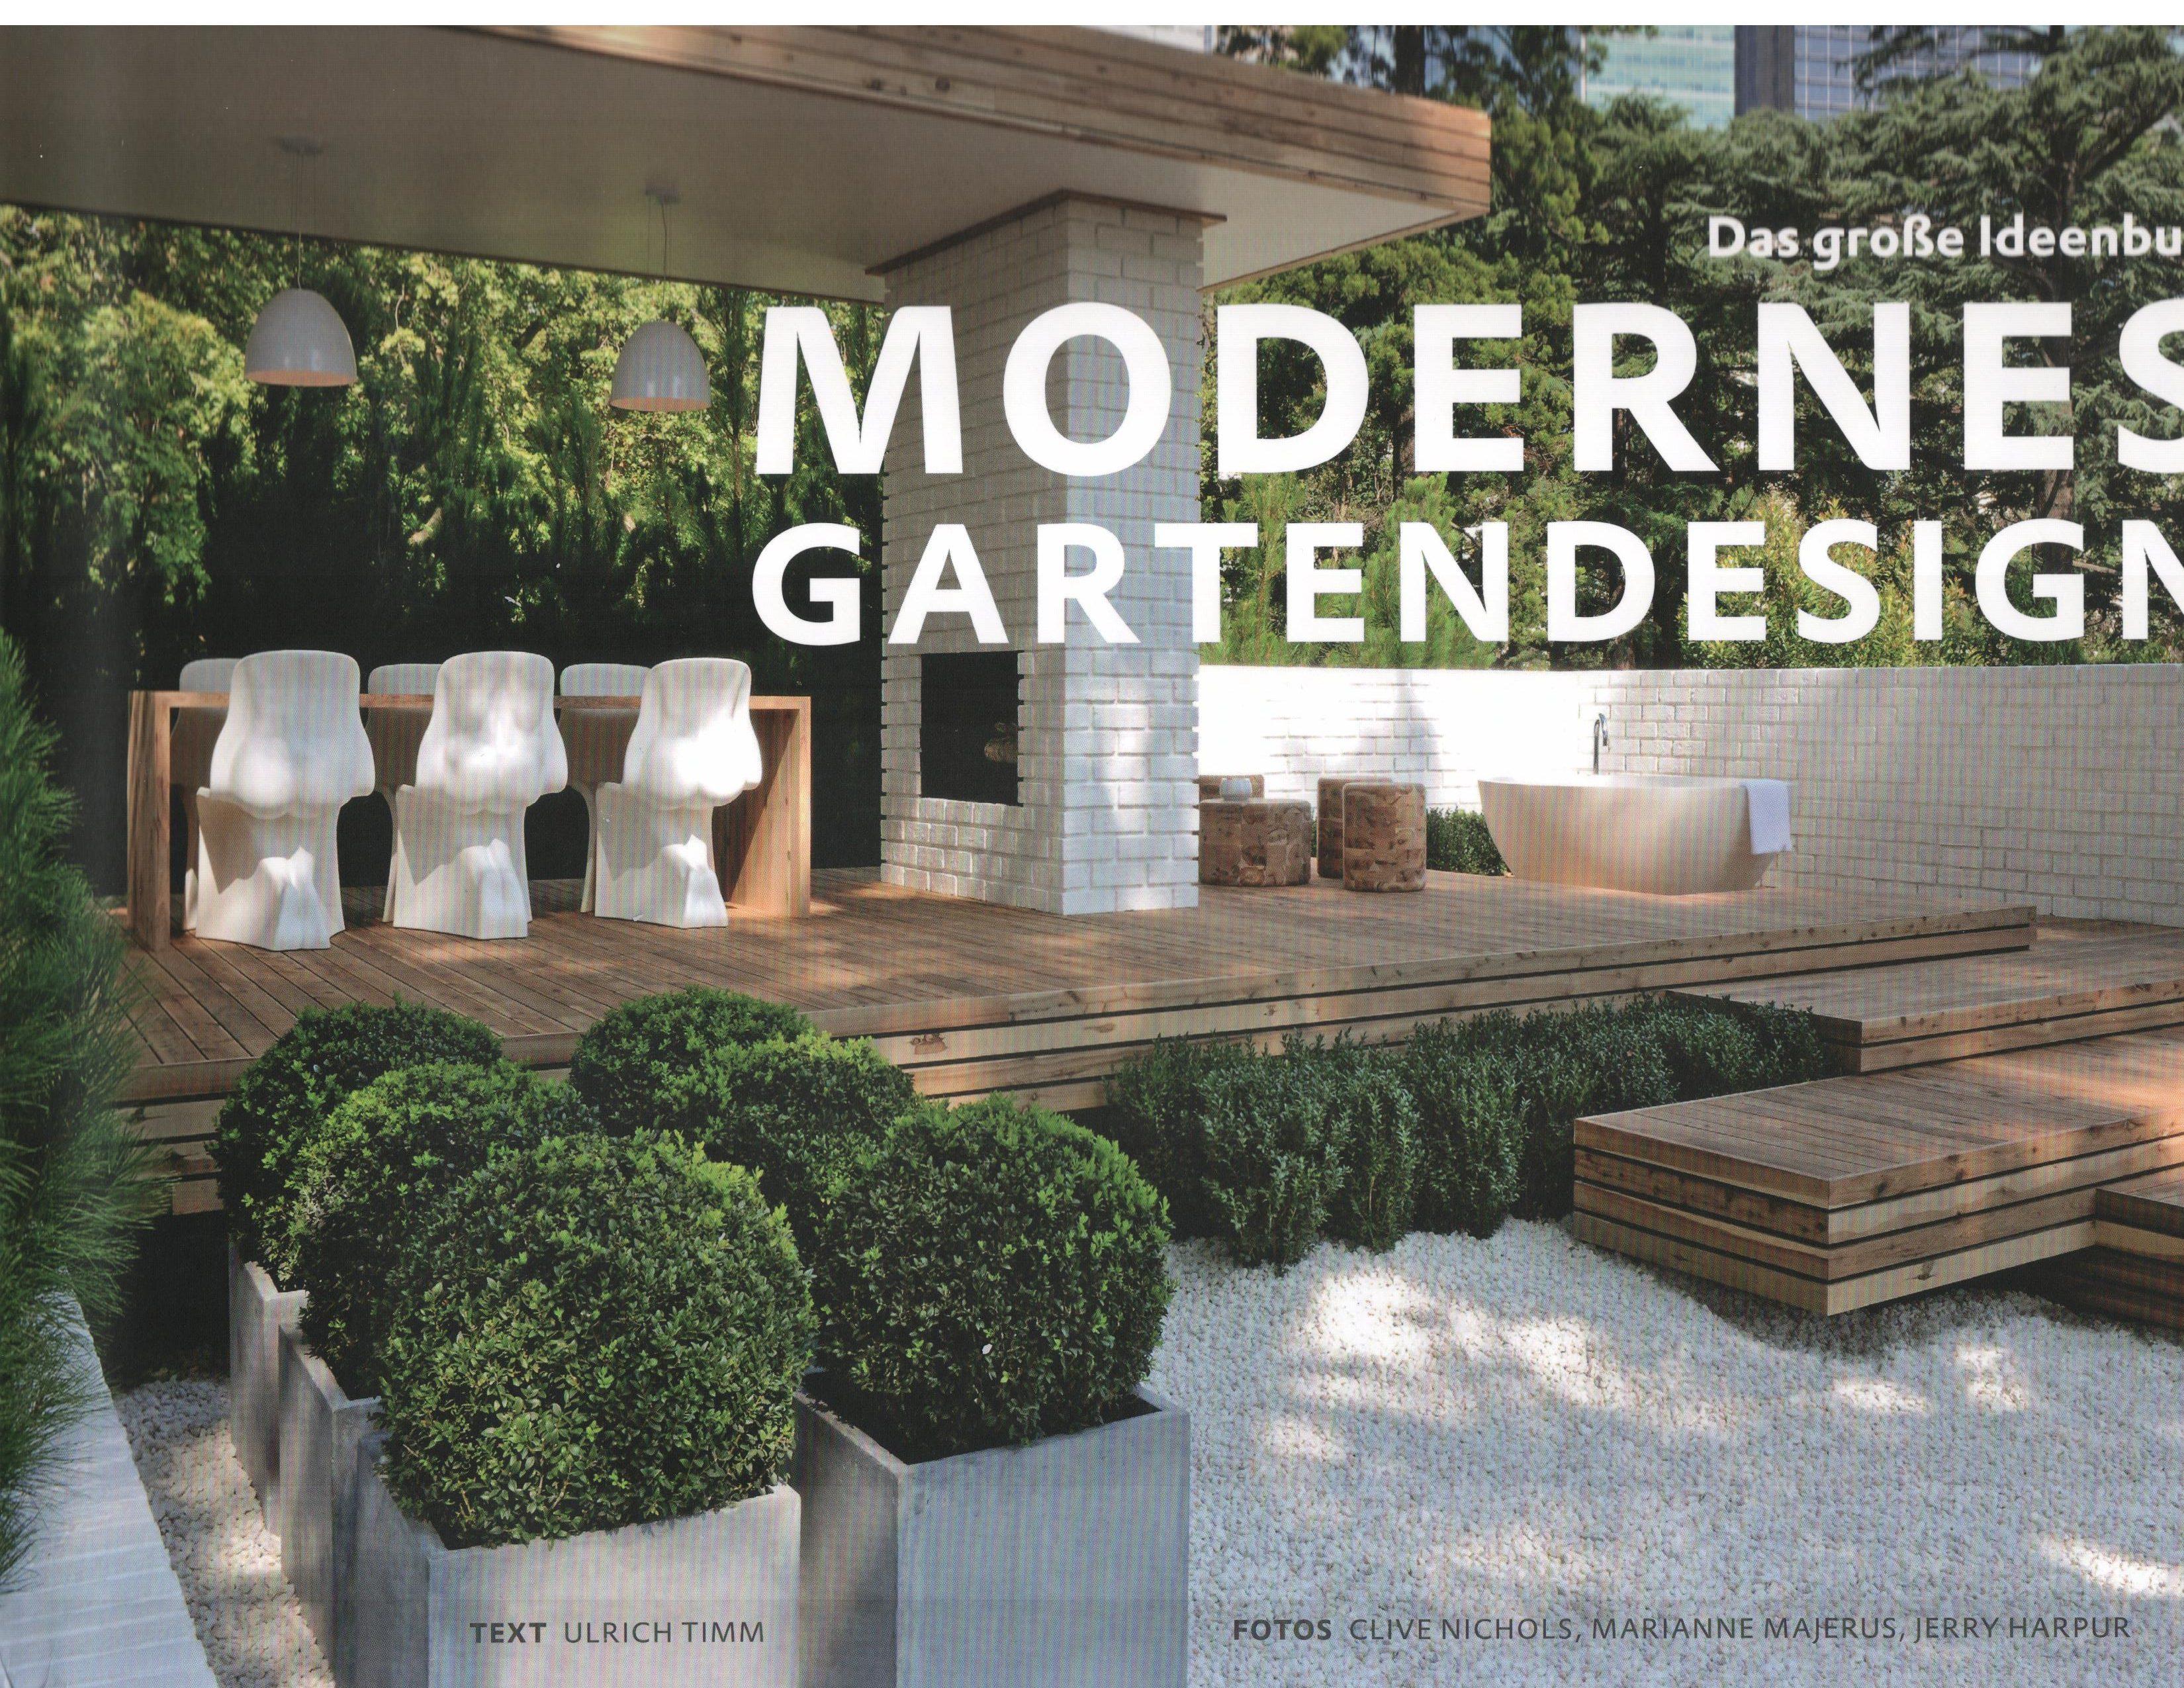 garten im quadrat modernes gartendesign das gro e. Black Bedroom Furniture Sets. Home Design Ideas